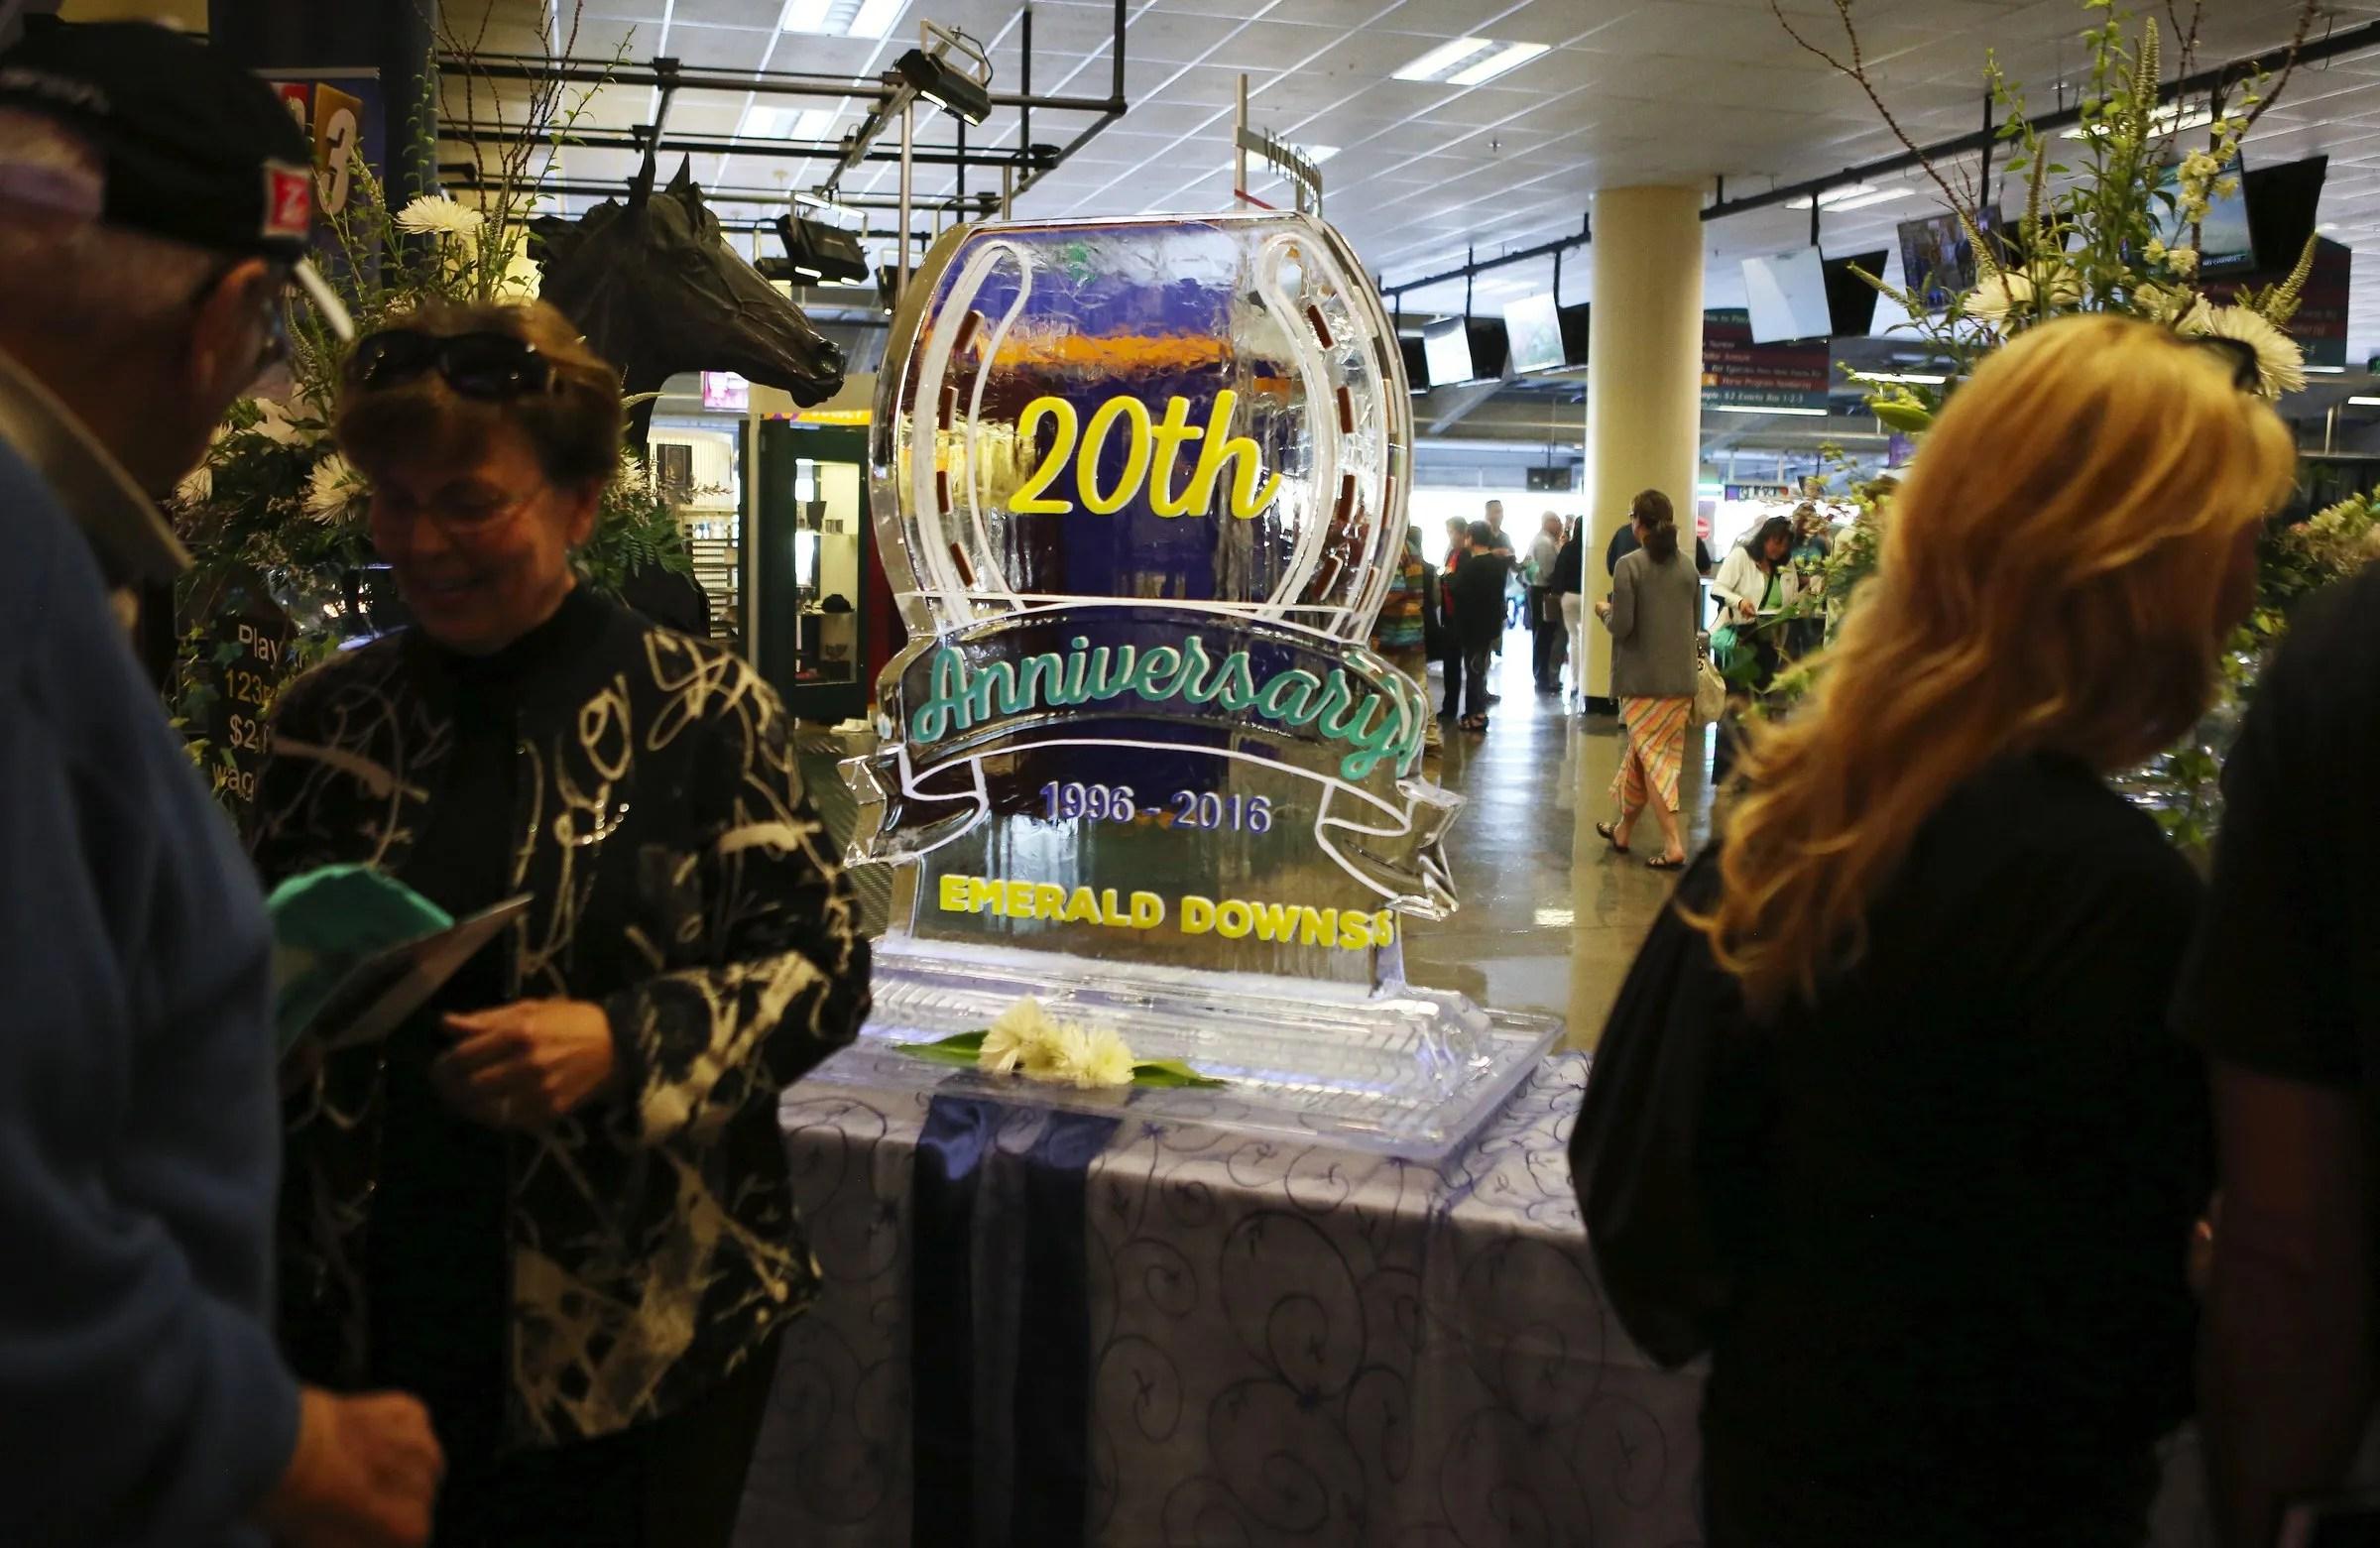 Photos Emerald Downs Celebrates 20th Anniversary The